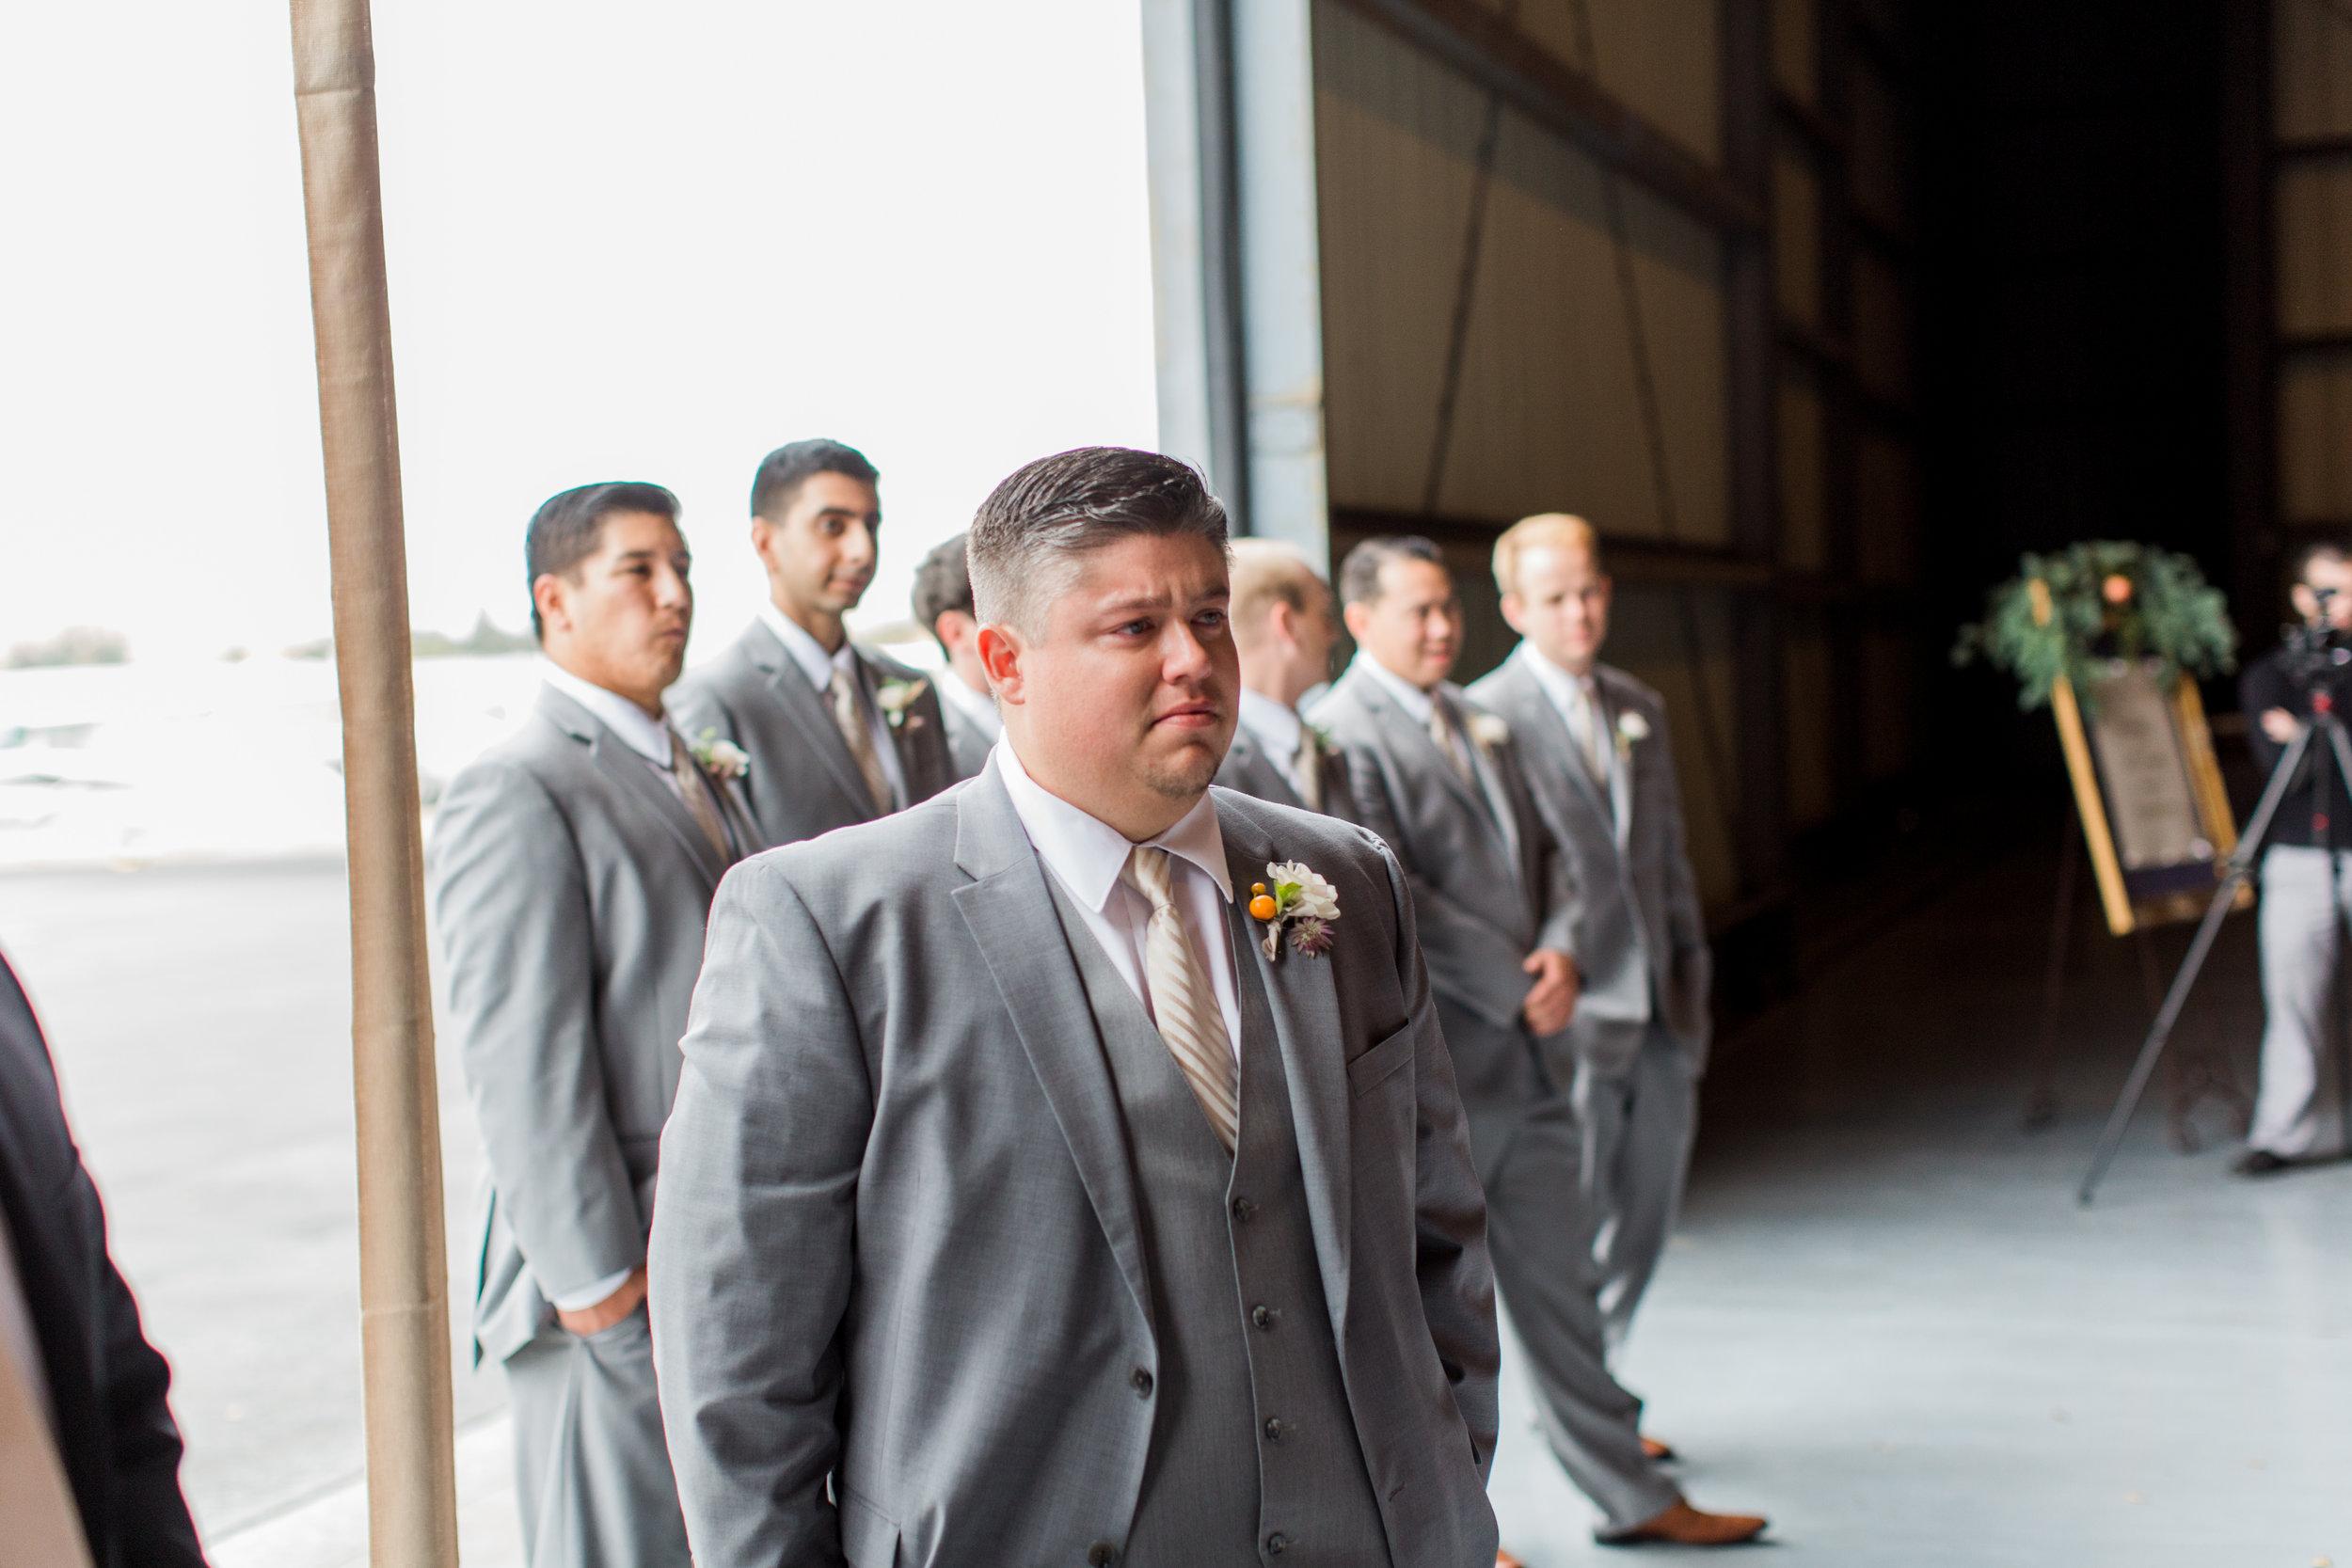 airport-hanger-wedding-at-attitude-aviation-in-livermore-41.jpg